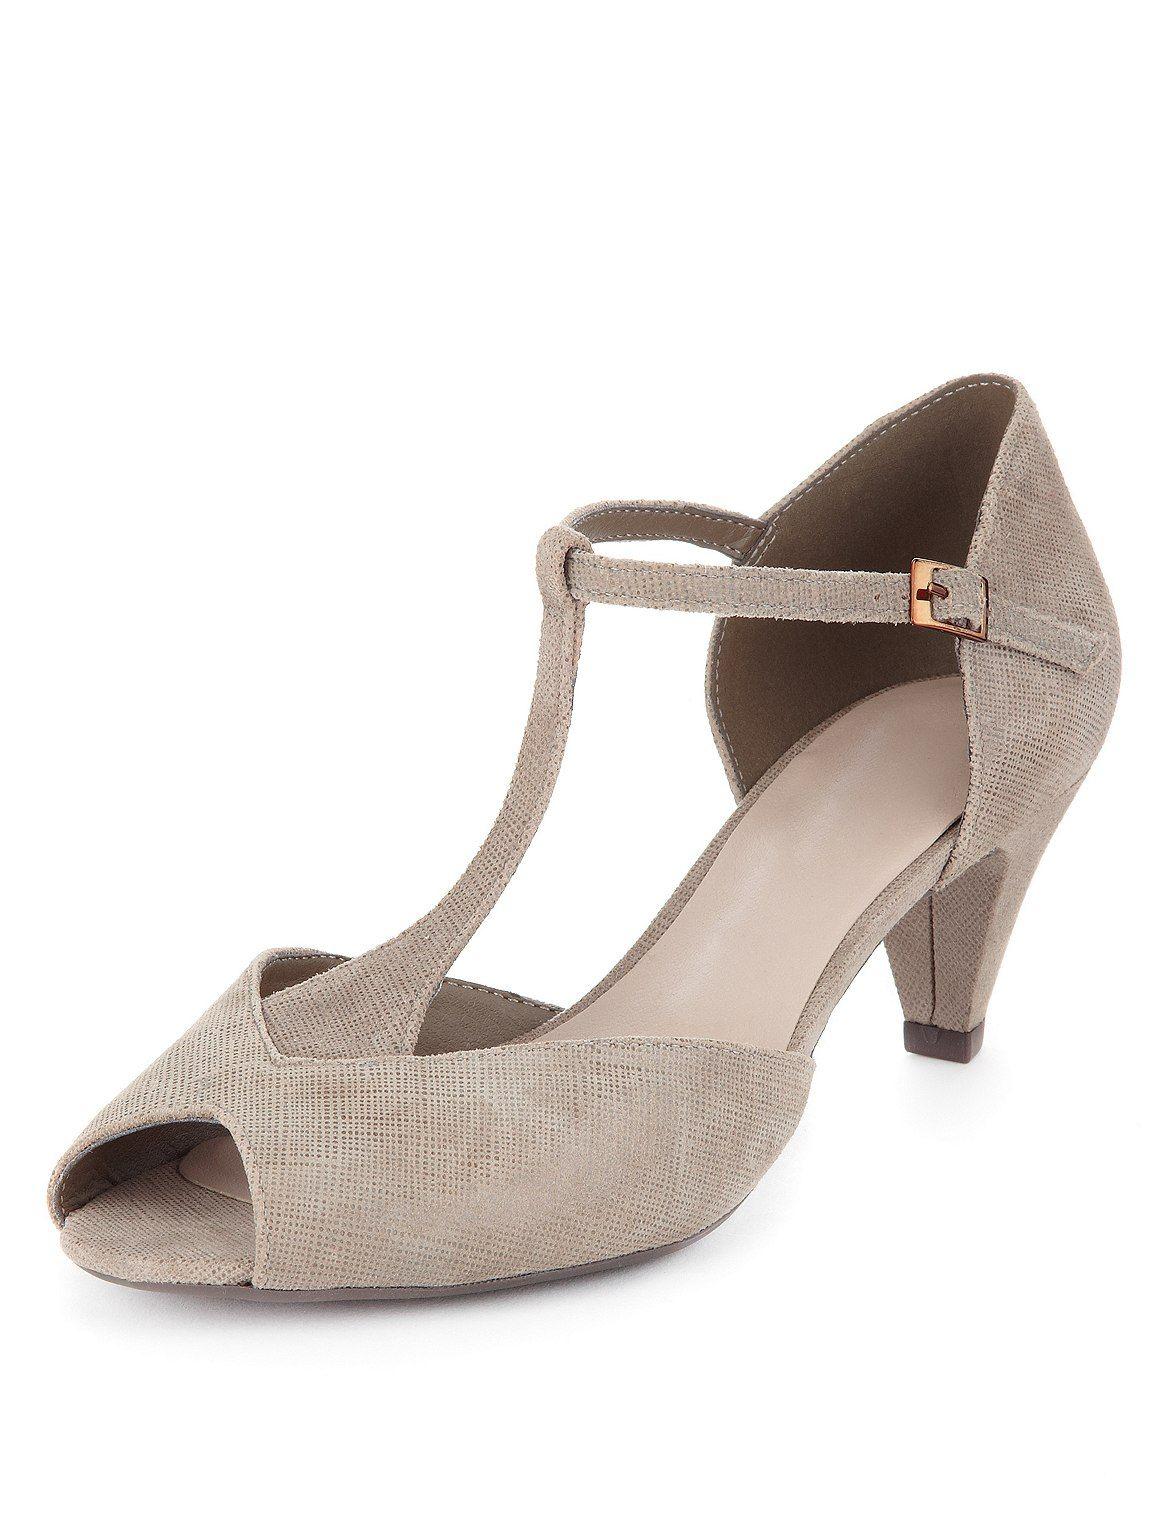 Footglove Suede Mid Heel T-Bar Wide Fit